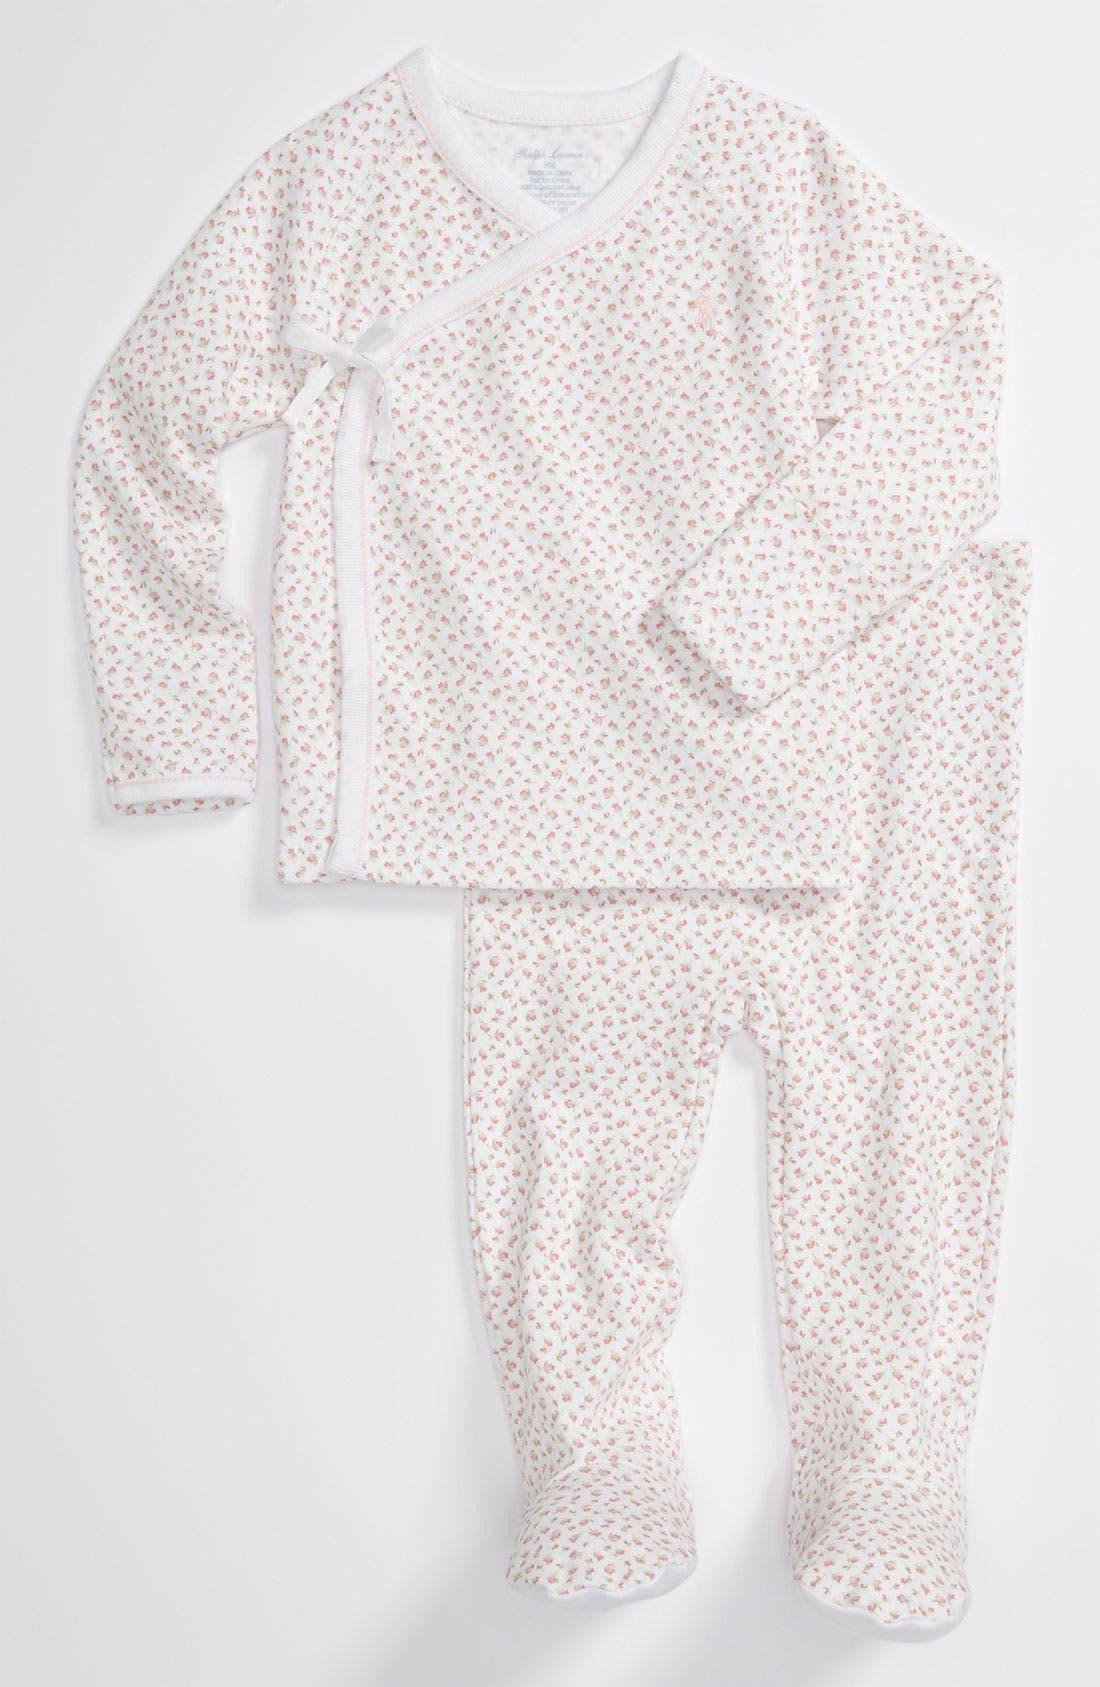 Main Image - Ralph Lauren Print Top & Footed Pants Set (Baby)